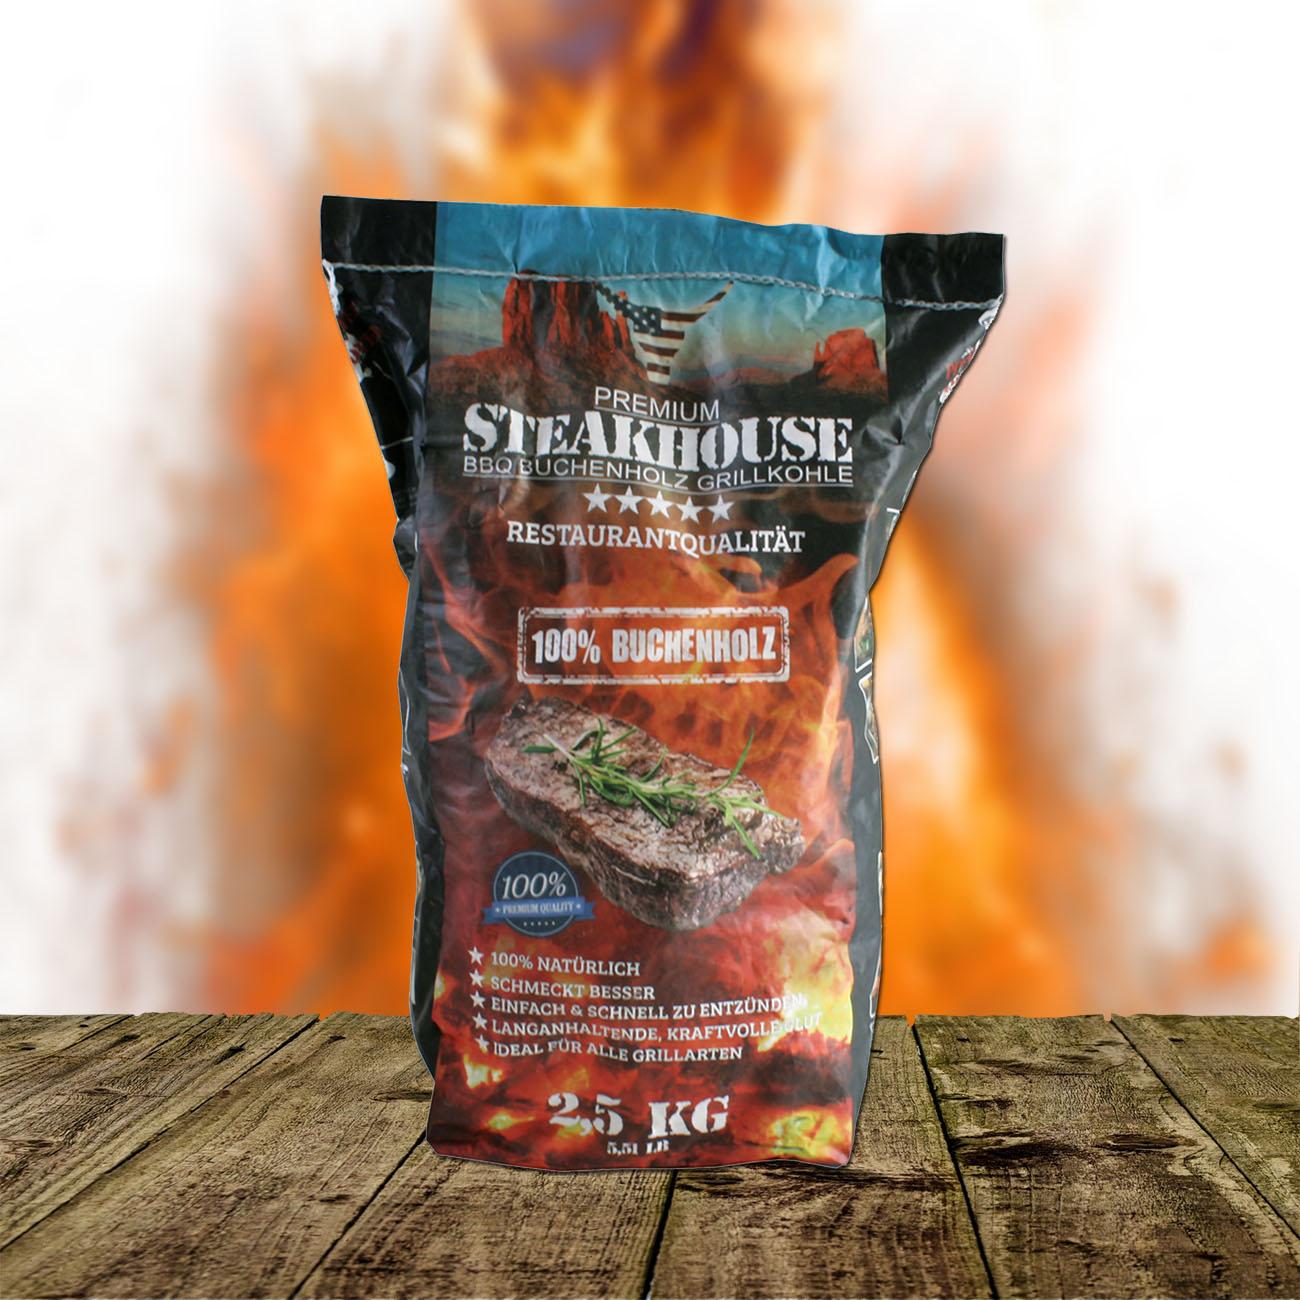 STABILO Steakhouse Premium Grillkohle aus Buche 2,5 kg 262901